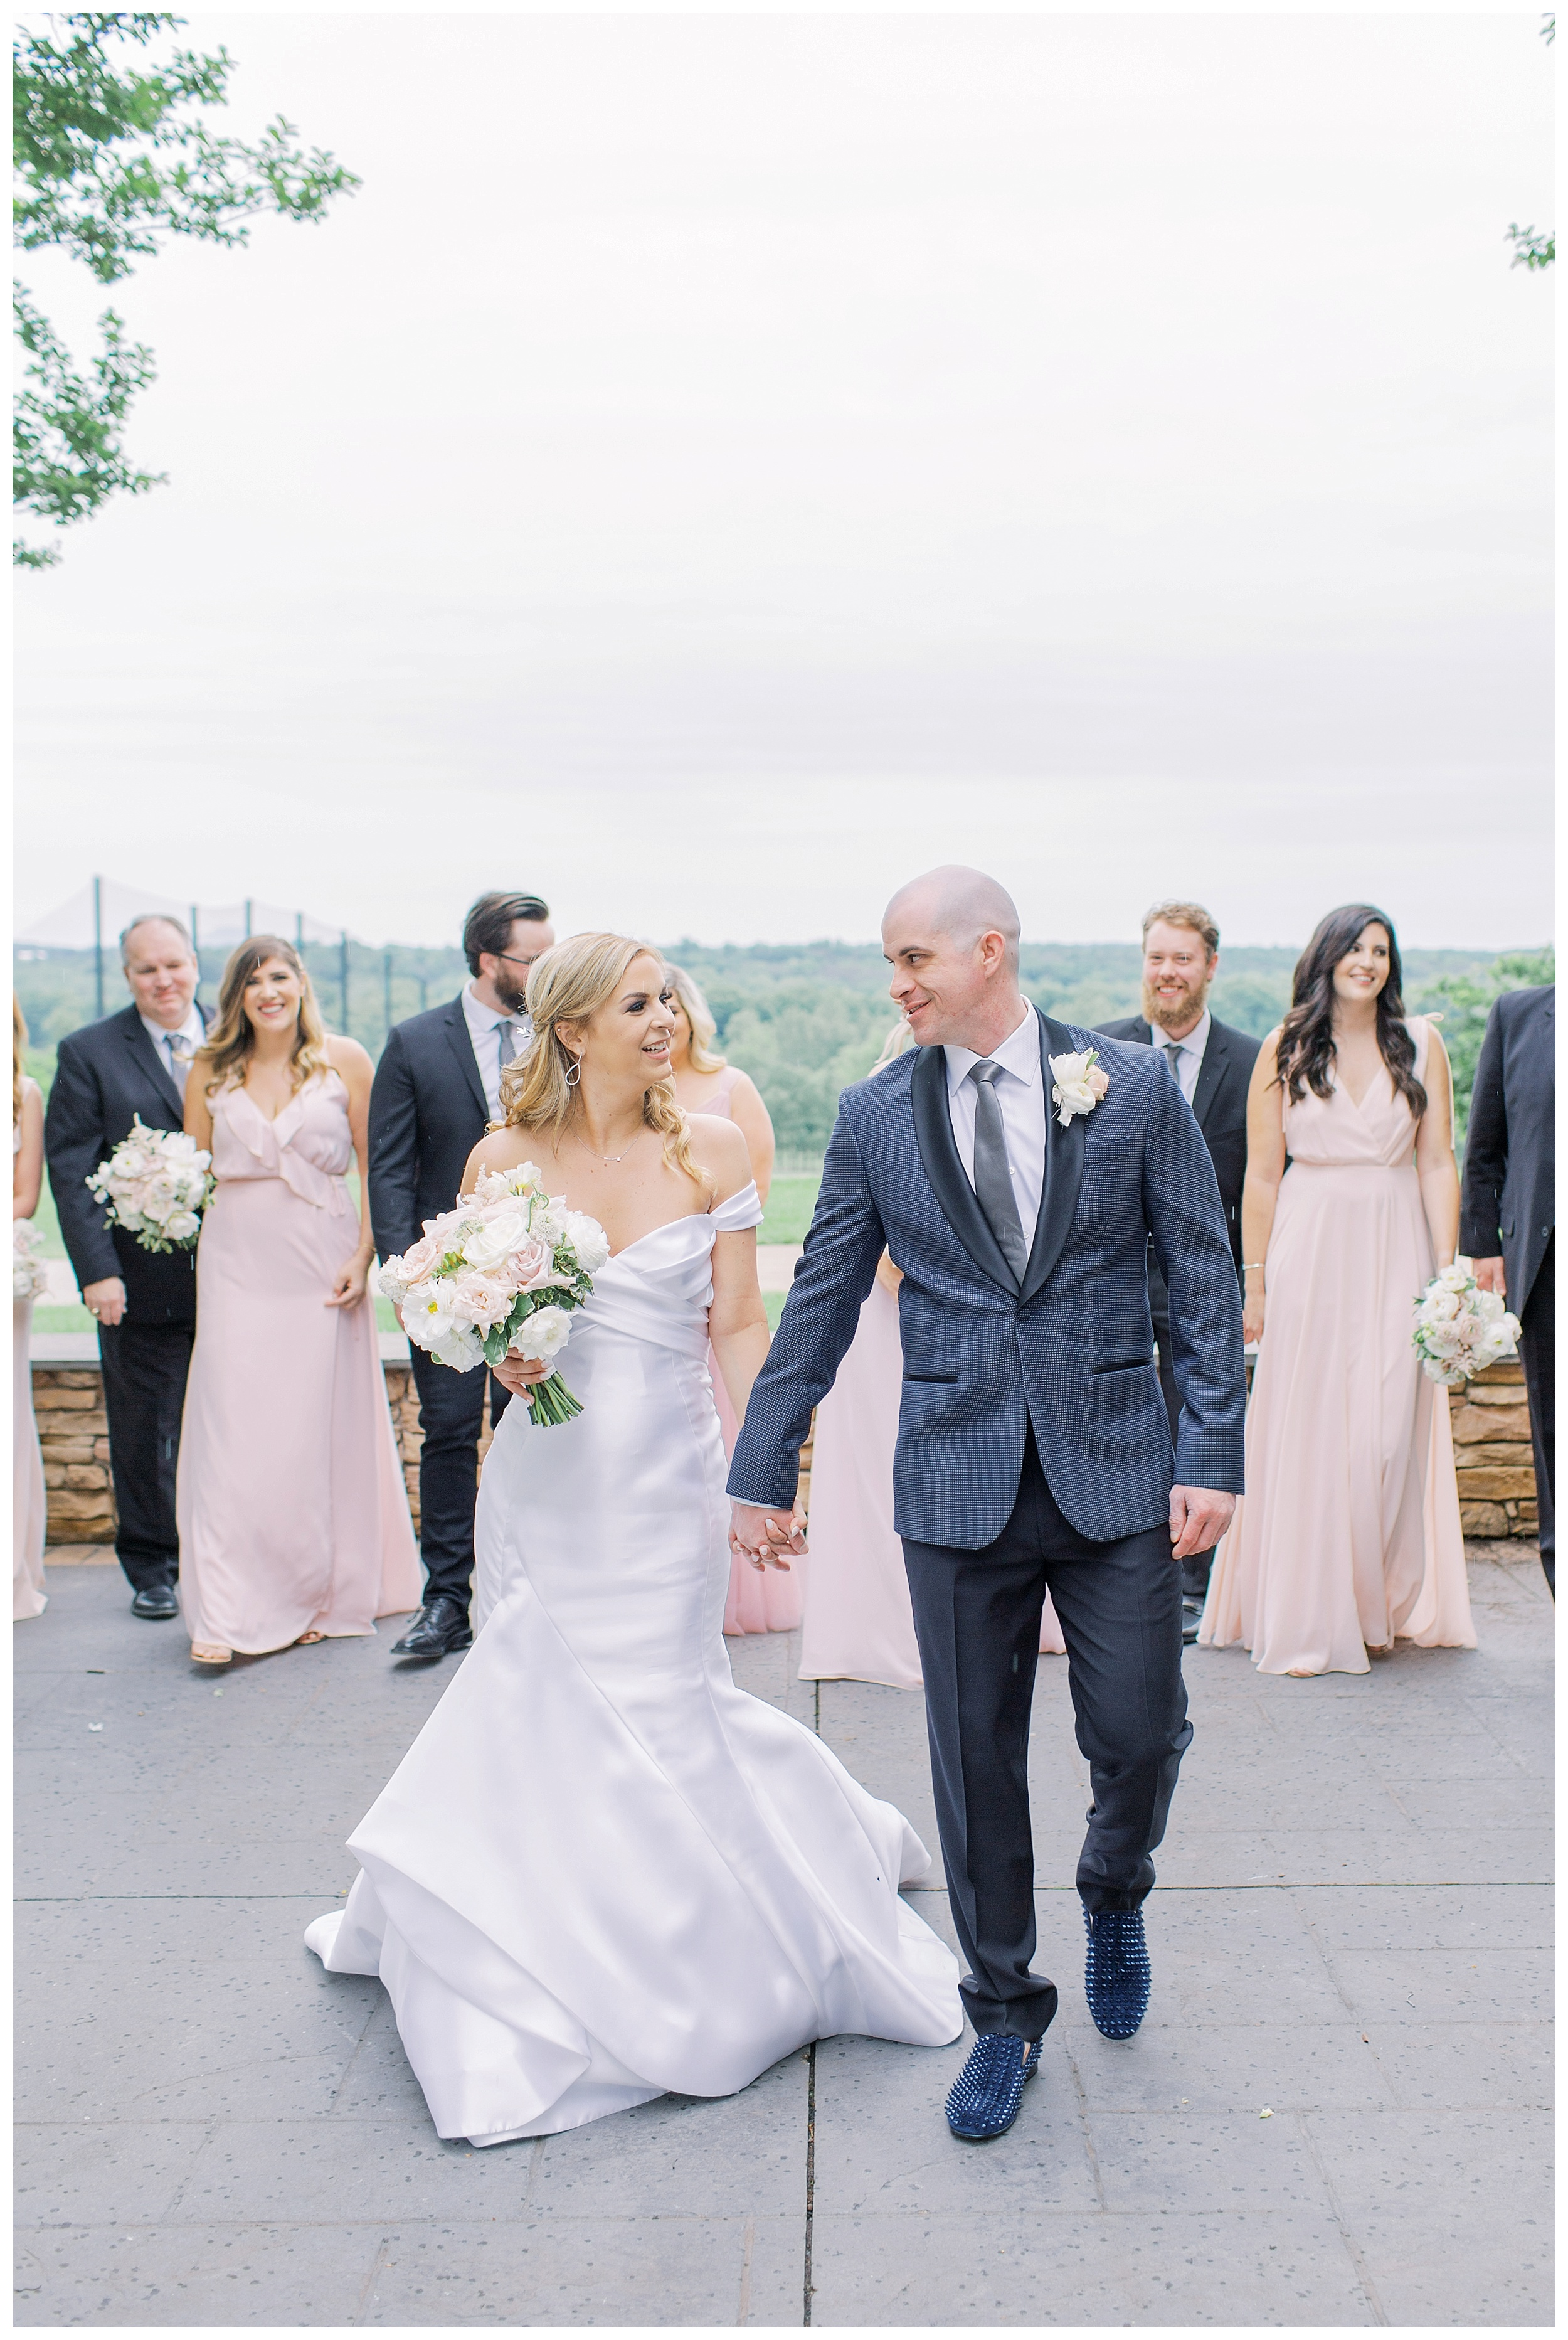 Lansdowne Resort Wedding | Virginia Film Wedding Photographer Kir Tuben_0054.jpg